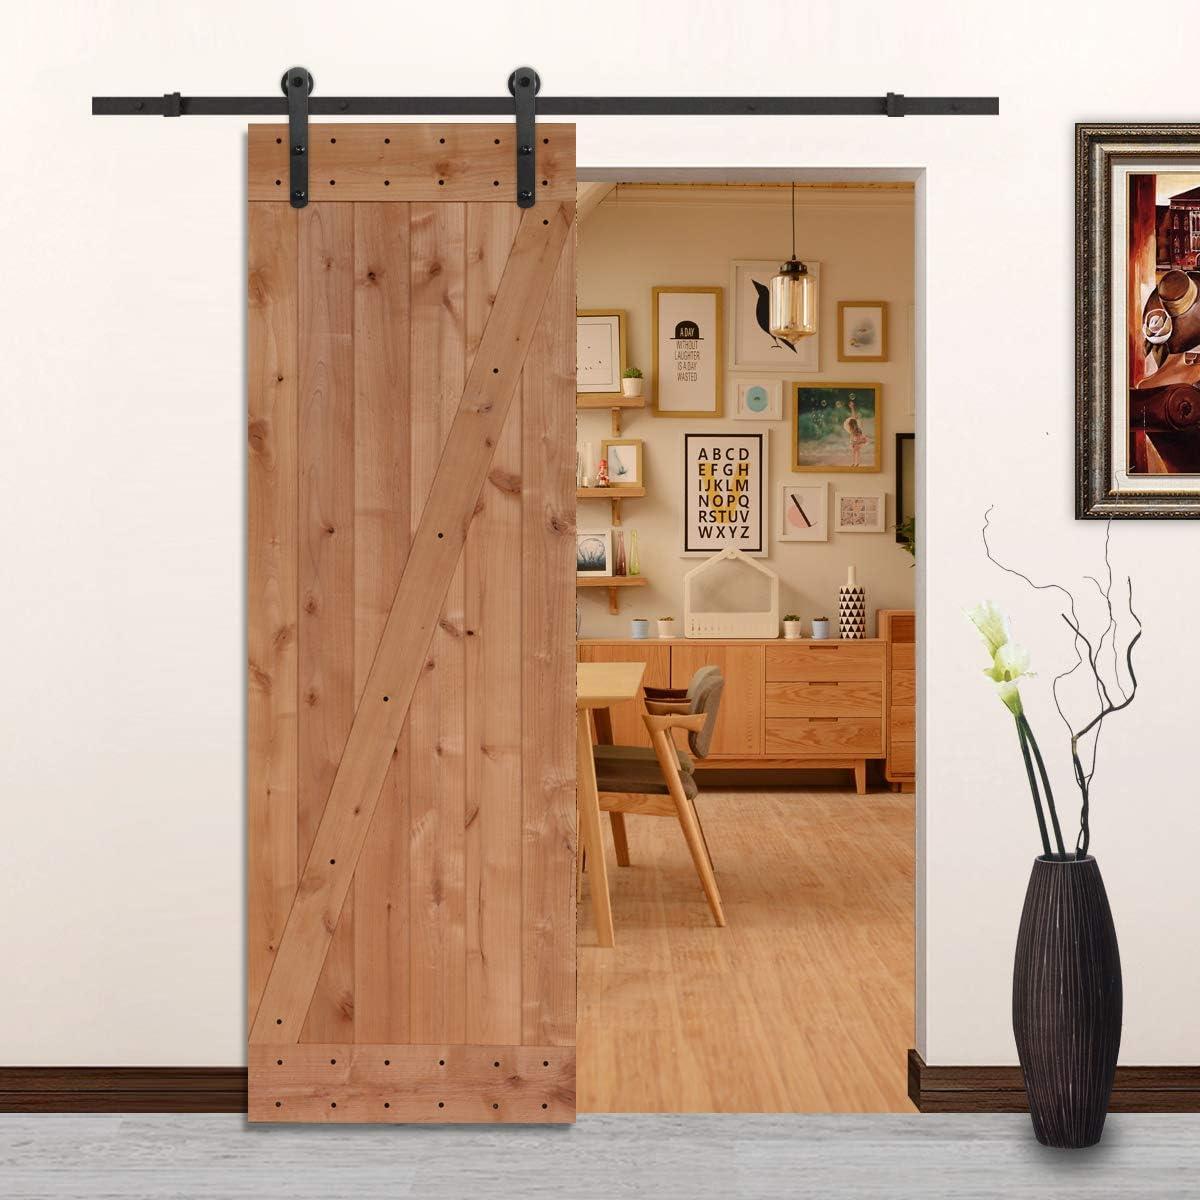 LUBANN - Lámina de madera maciza para puerta, diseño rústico ...